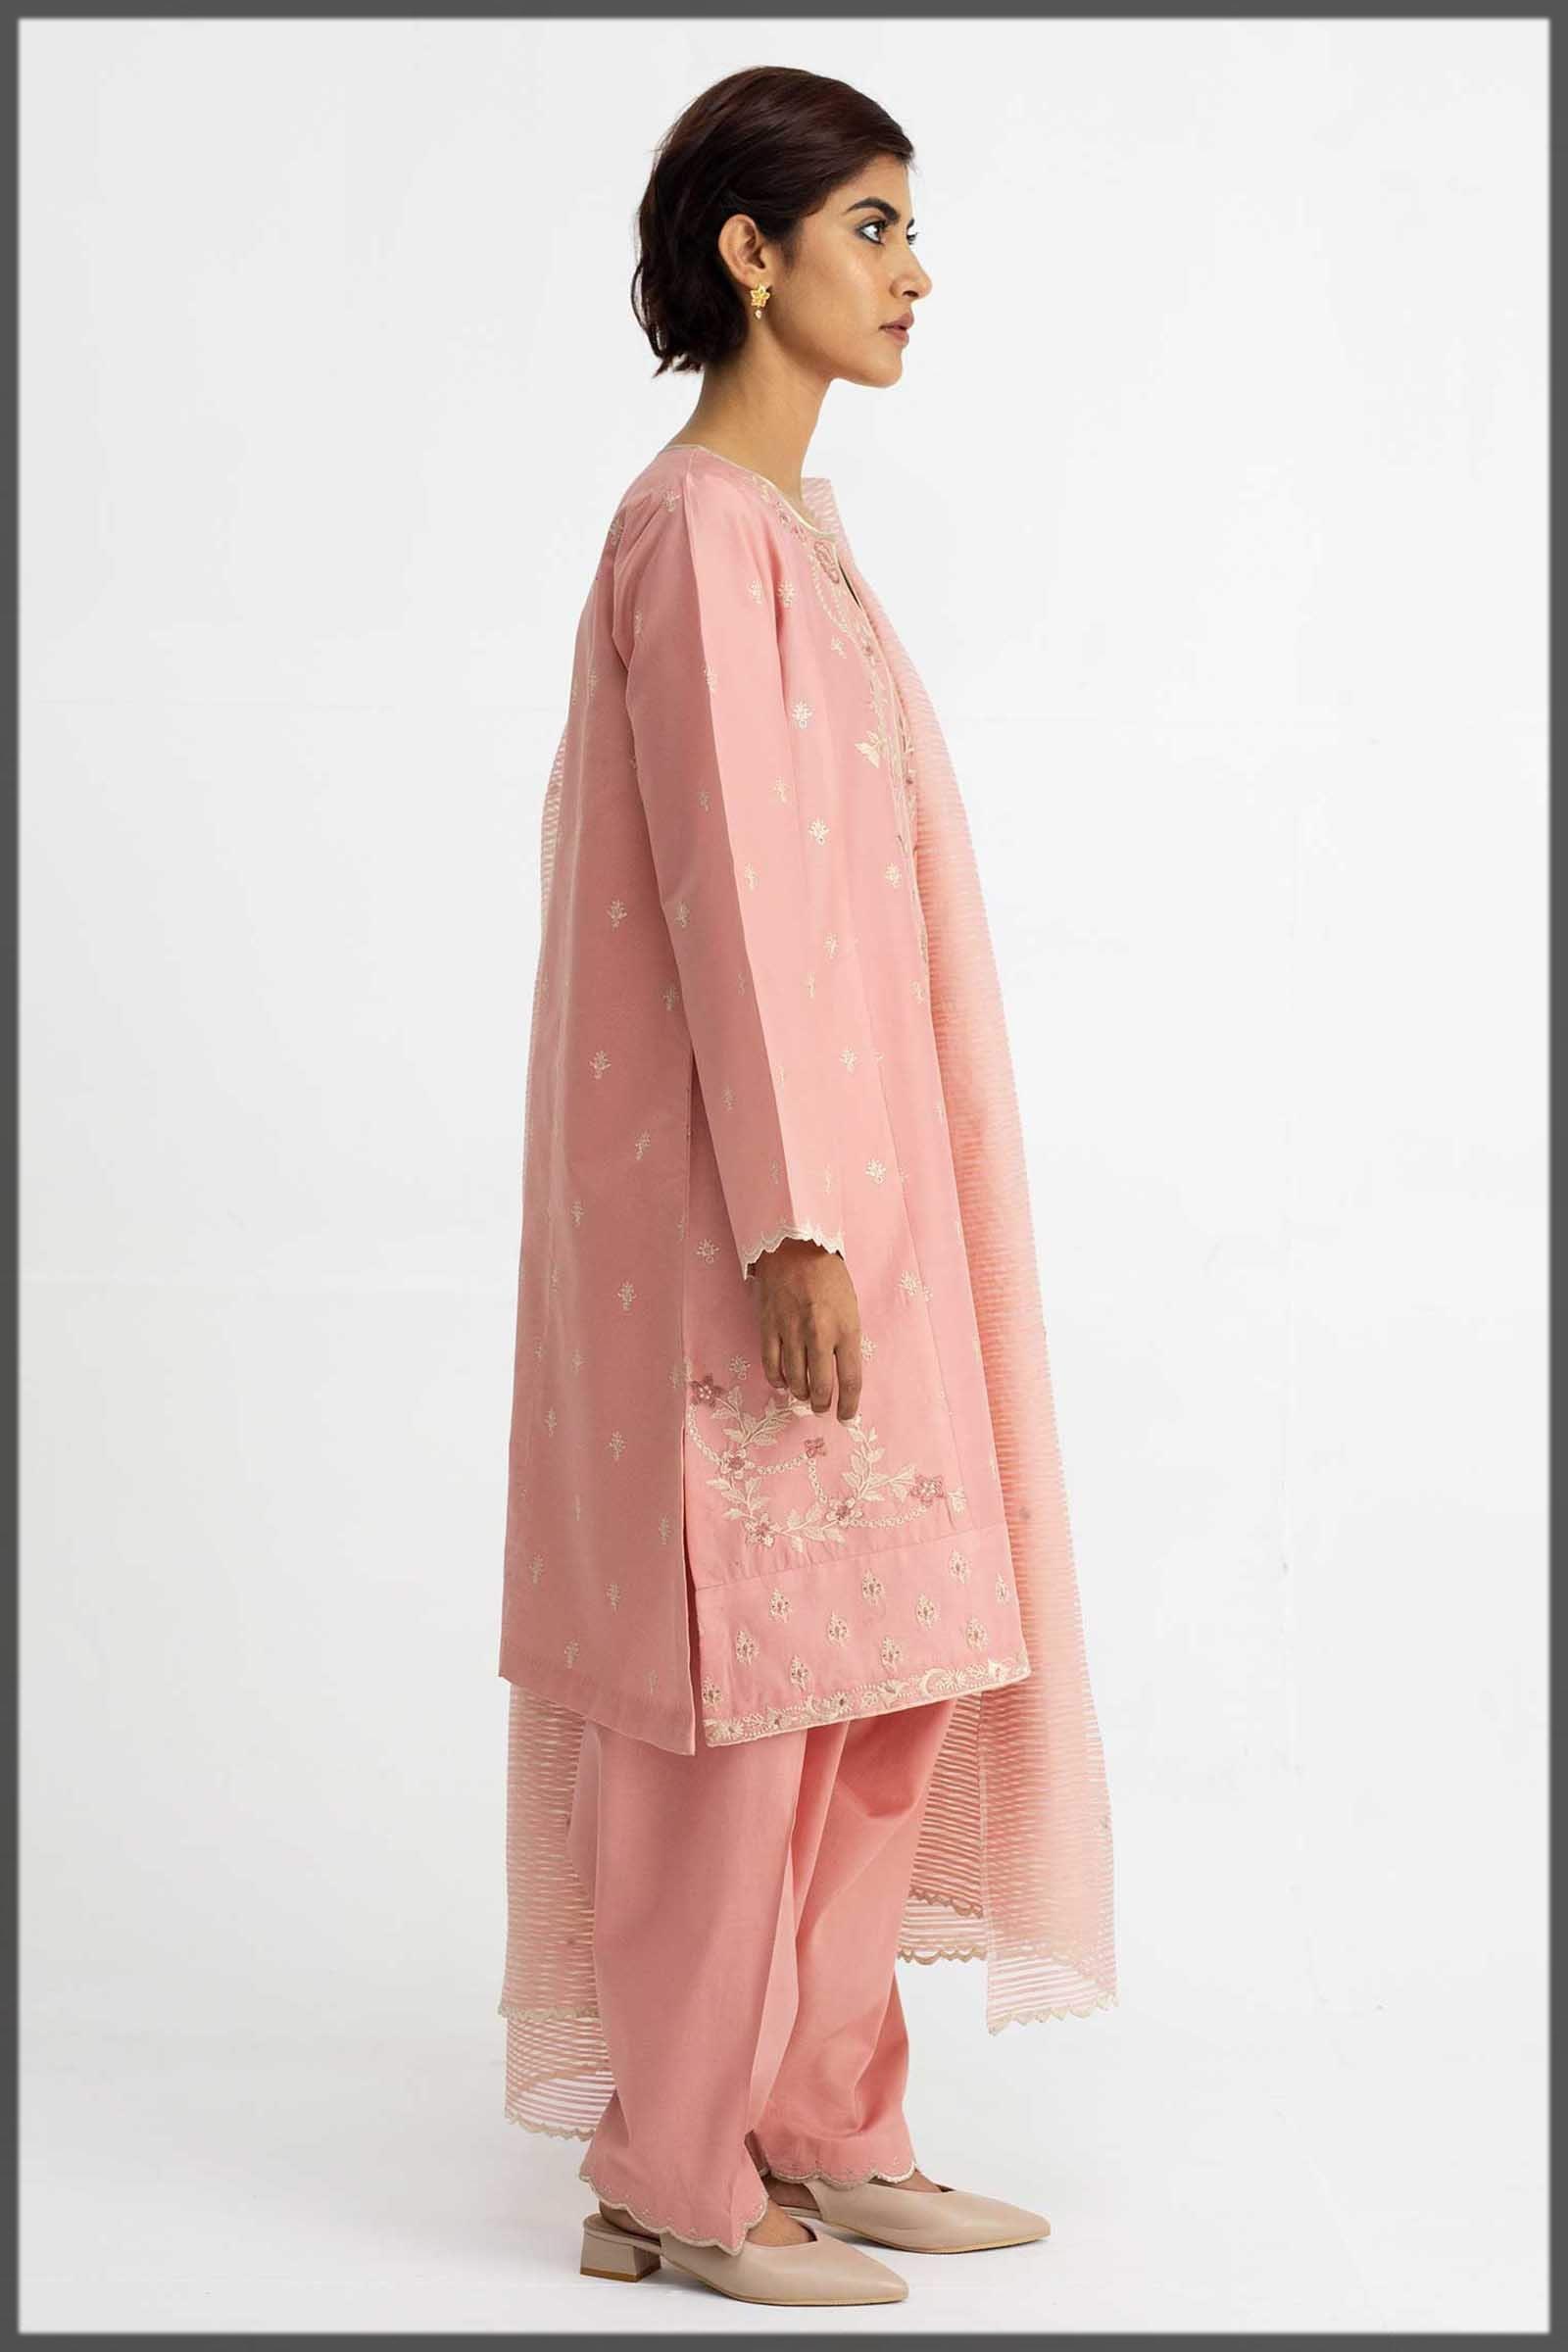 beautiful tea pink summer ensemble